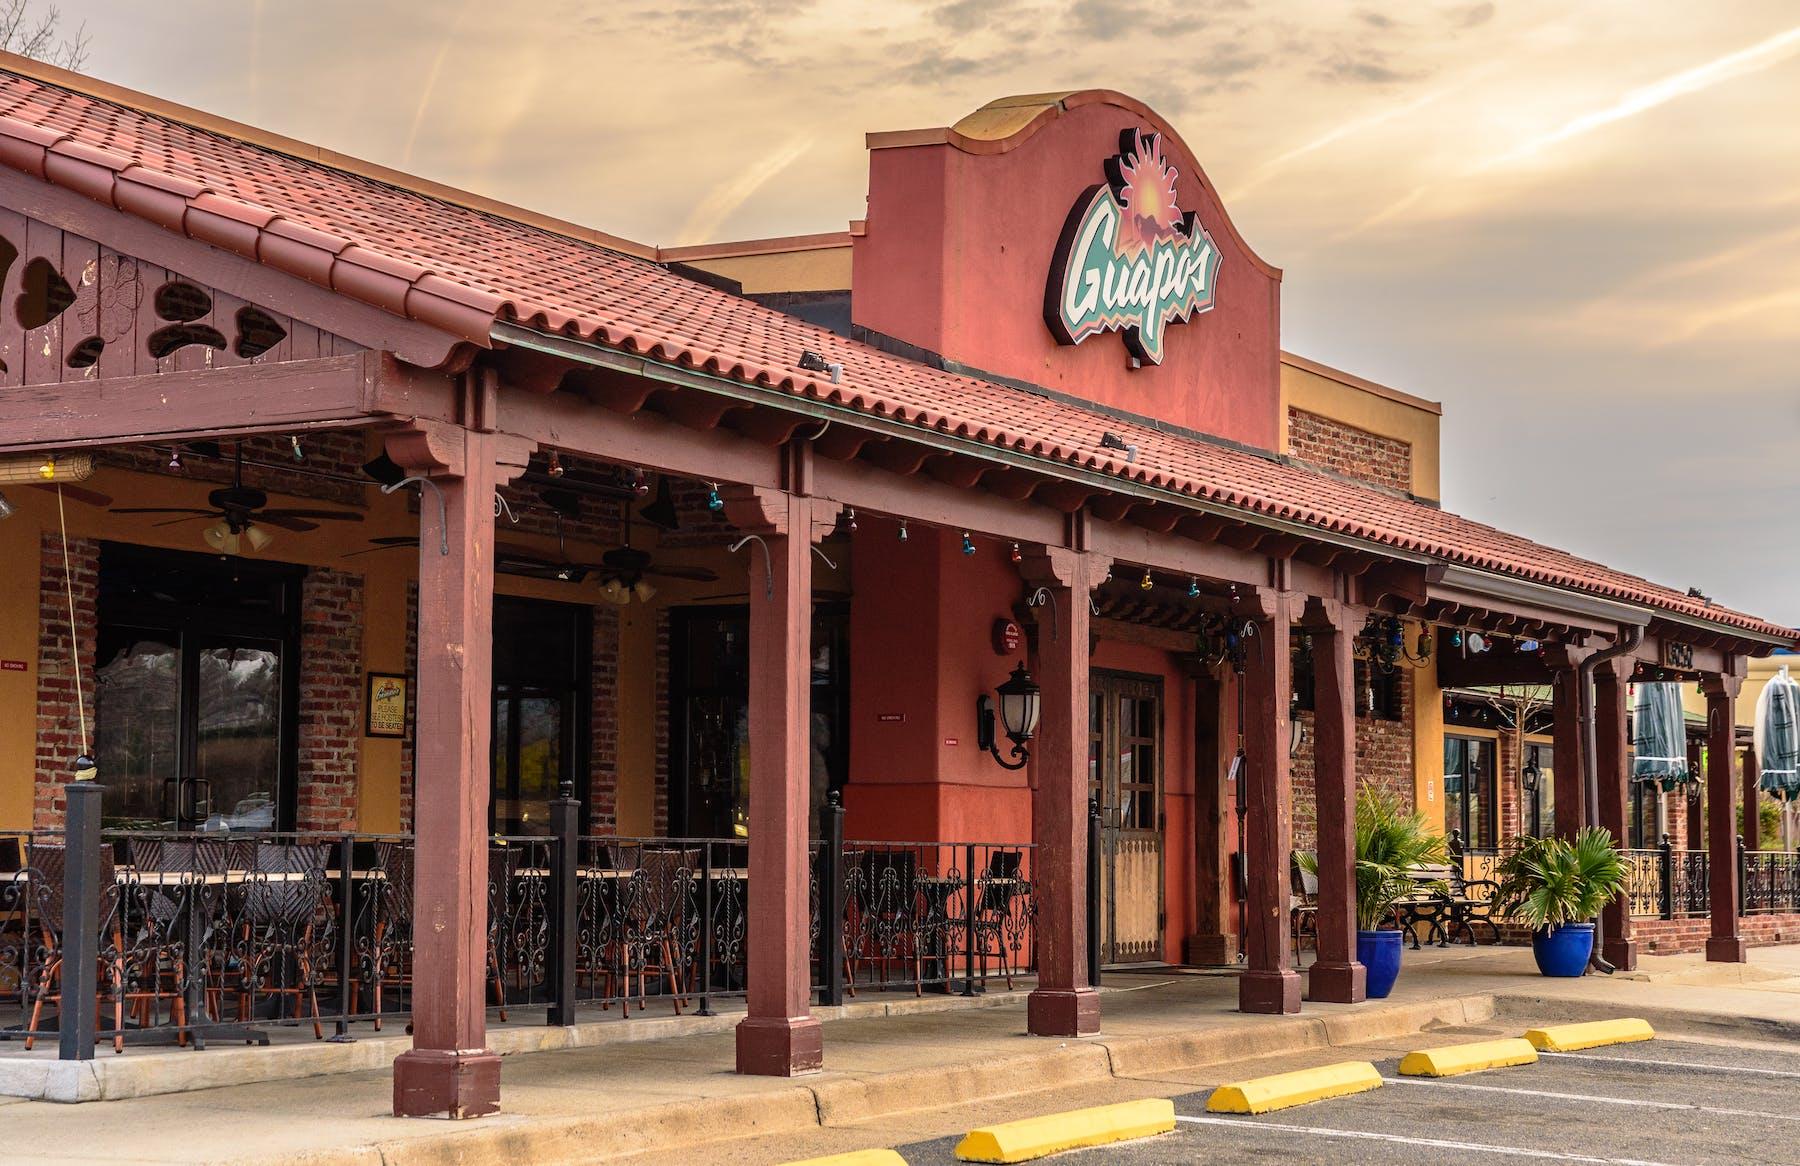 Tenleytown Hours Location Guapo S Restaurant